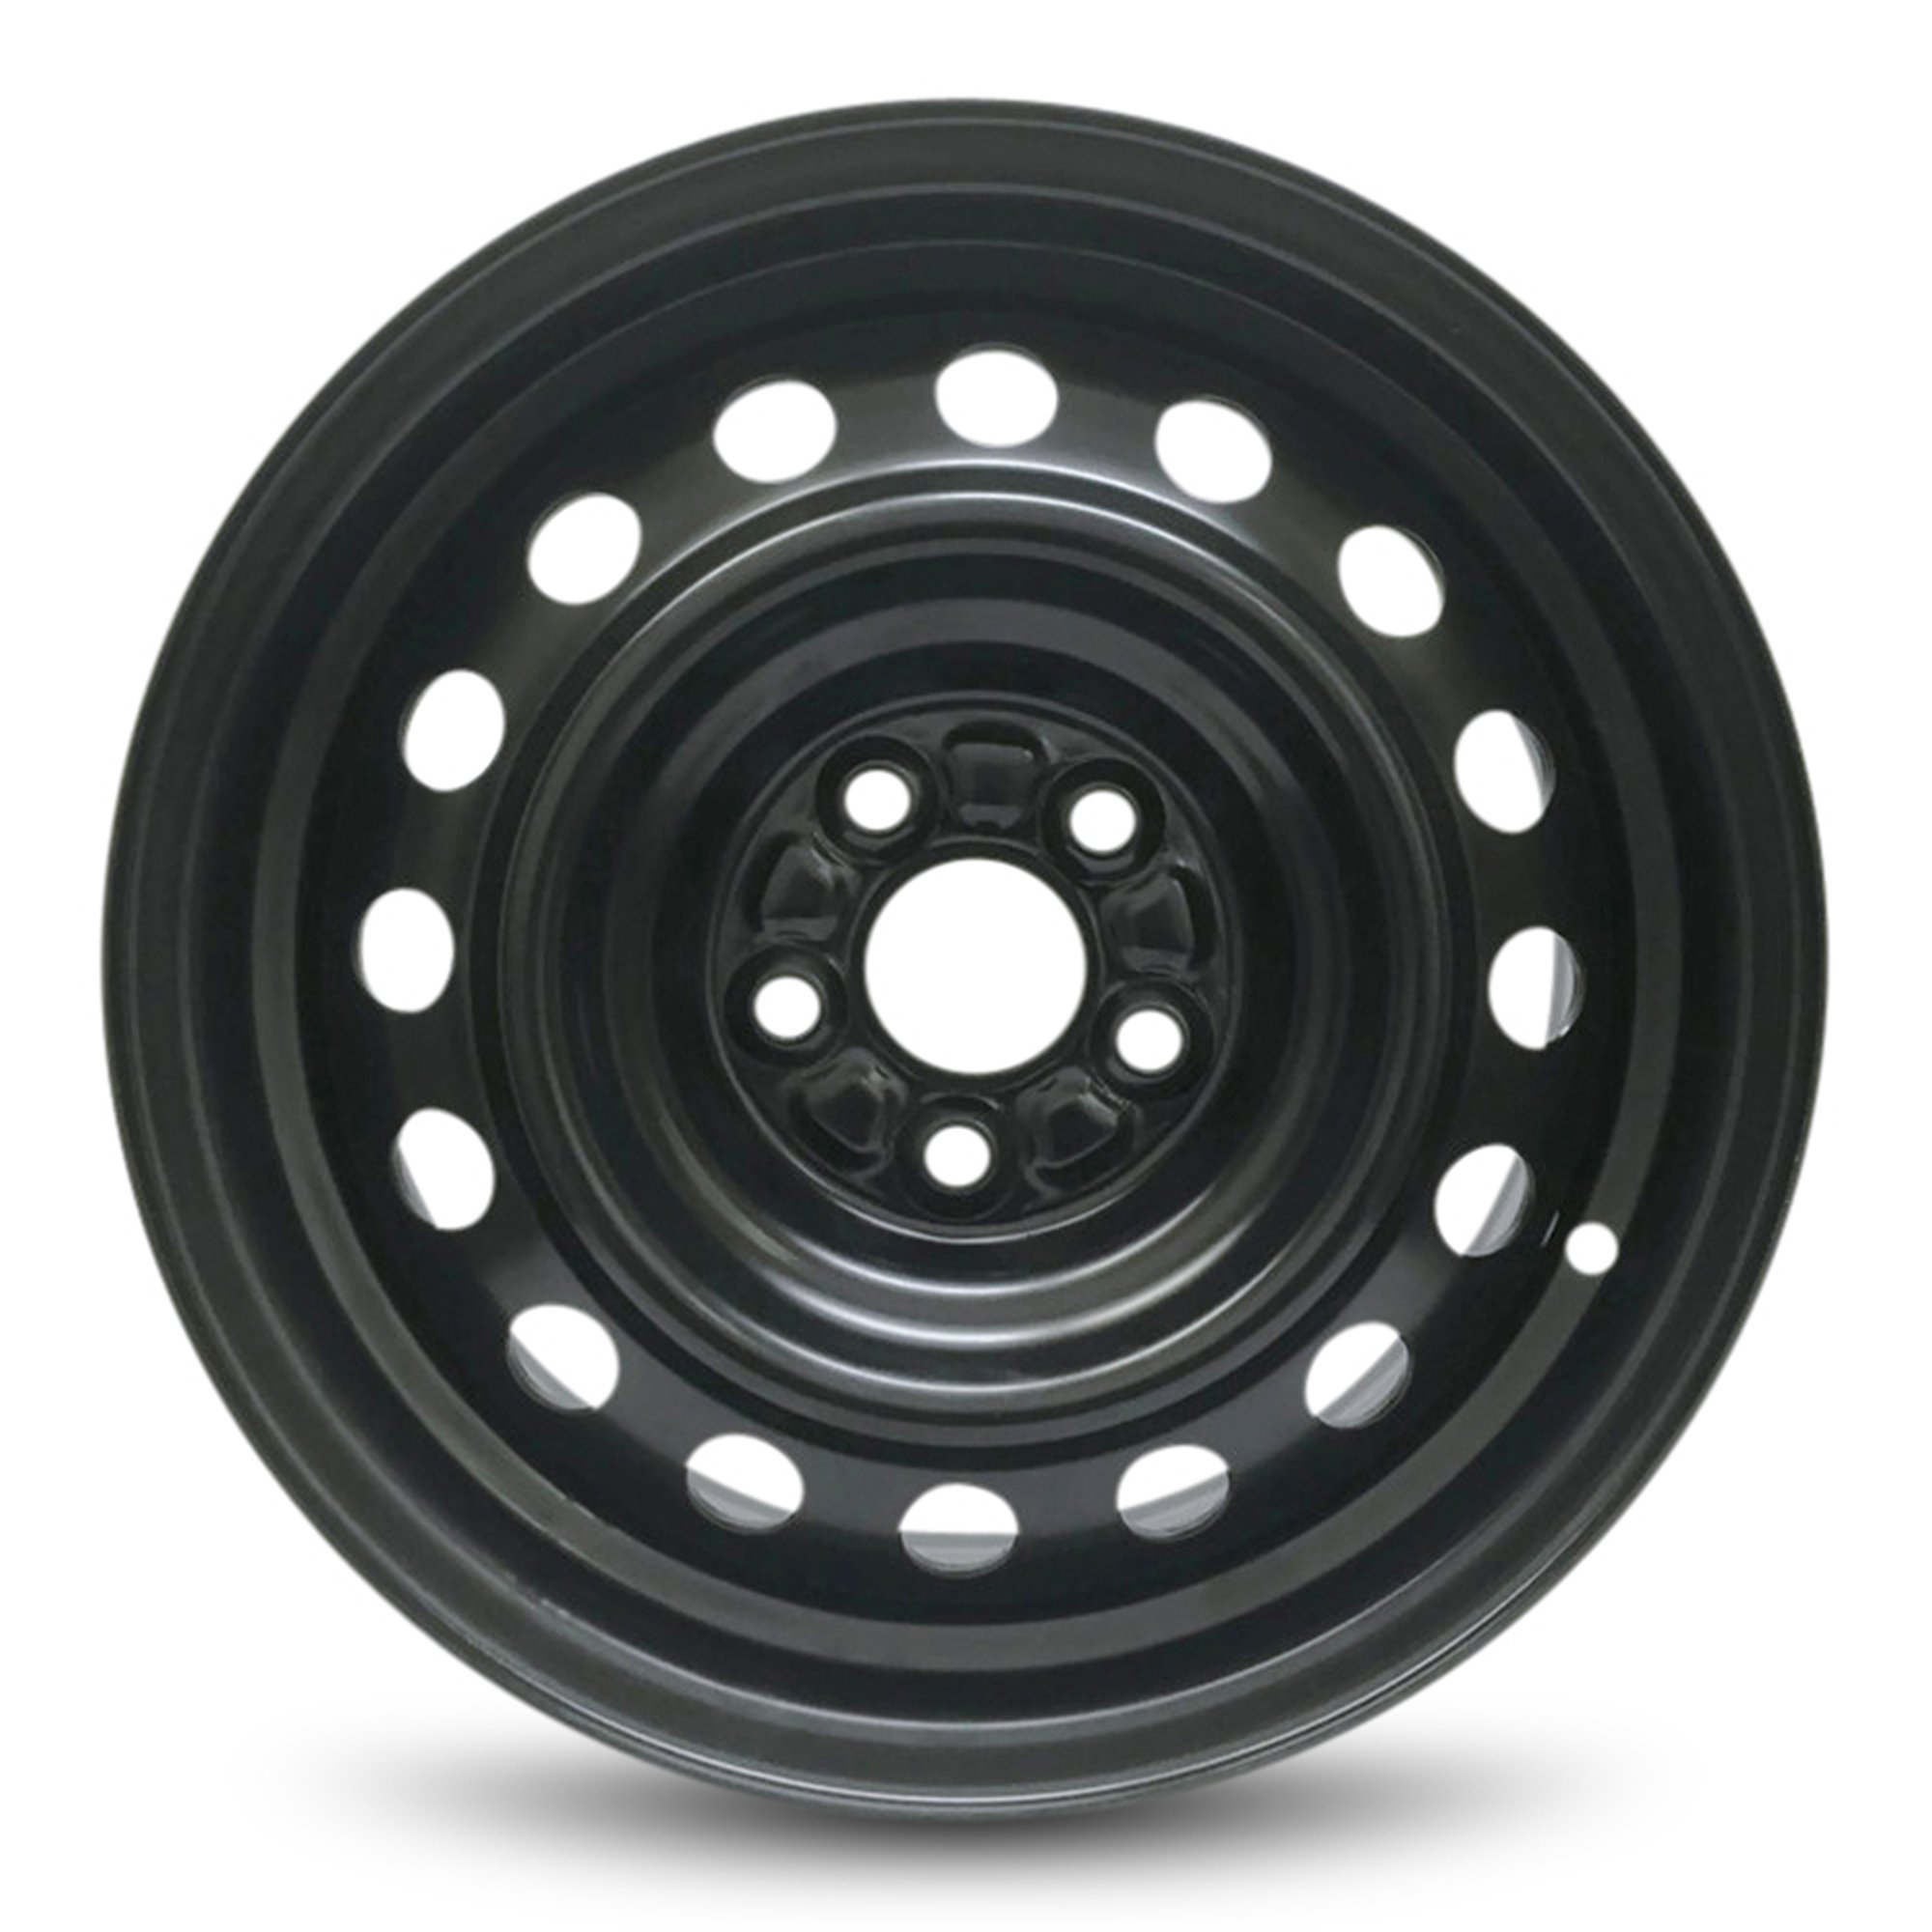 Toyota Corolla 15'' 5 Lug Steel Wheel/15X6 inch Steel Rim